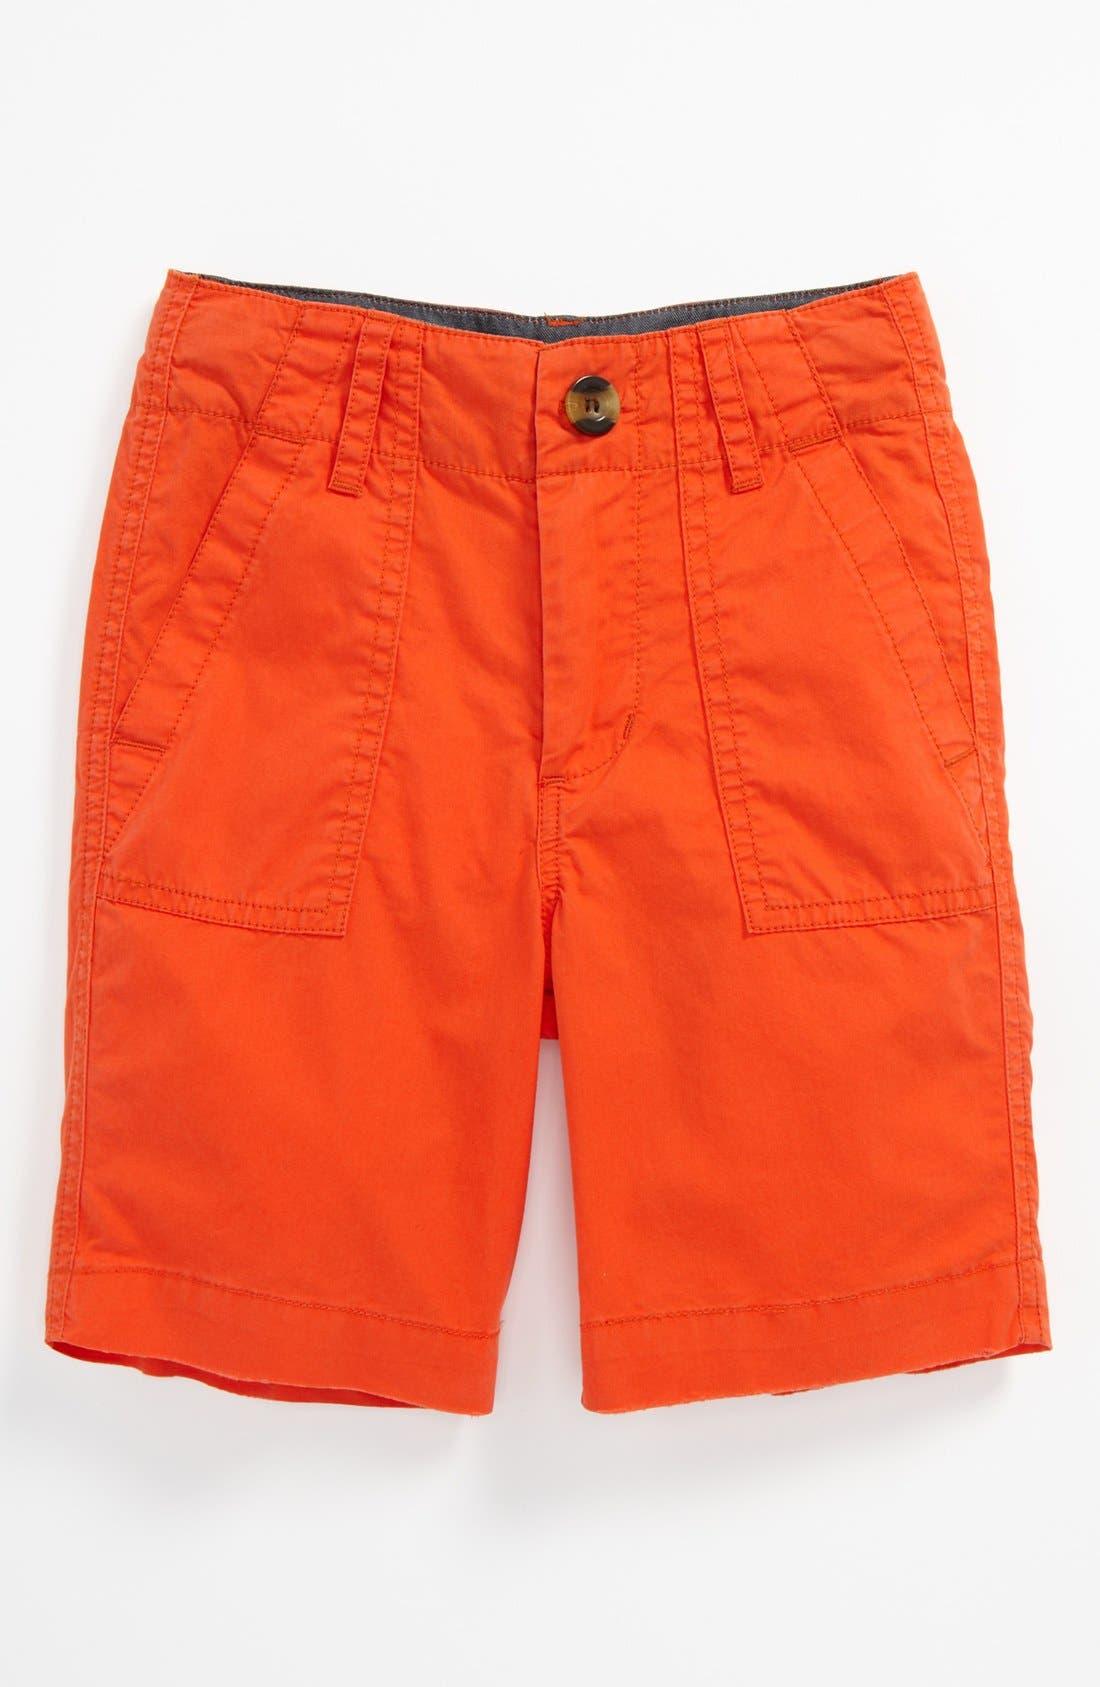 Alternate Image 1 Selected - Peek 'Jericho' Utility Shorts (Toddler Boys, Little Boys & Big Boys)